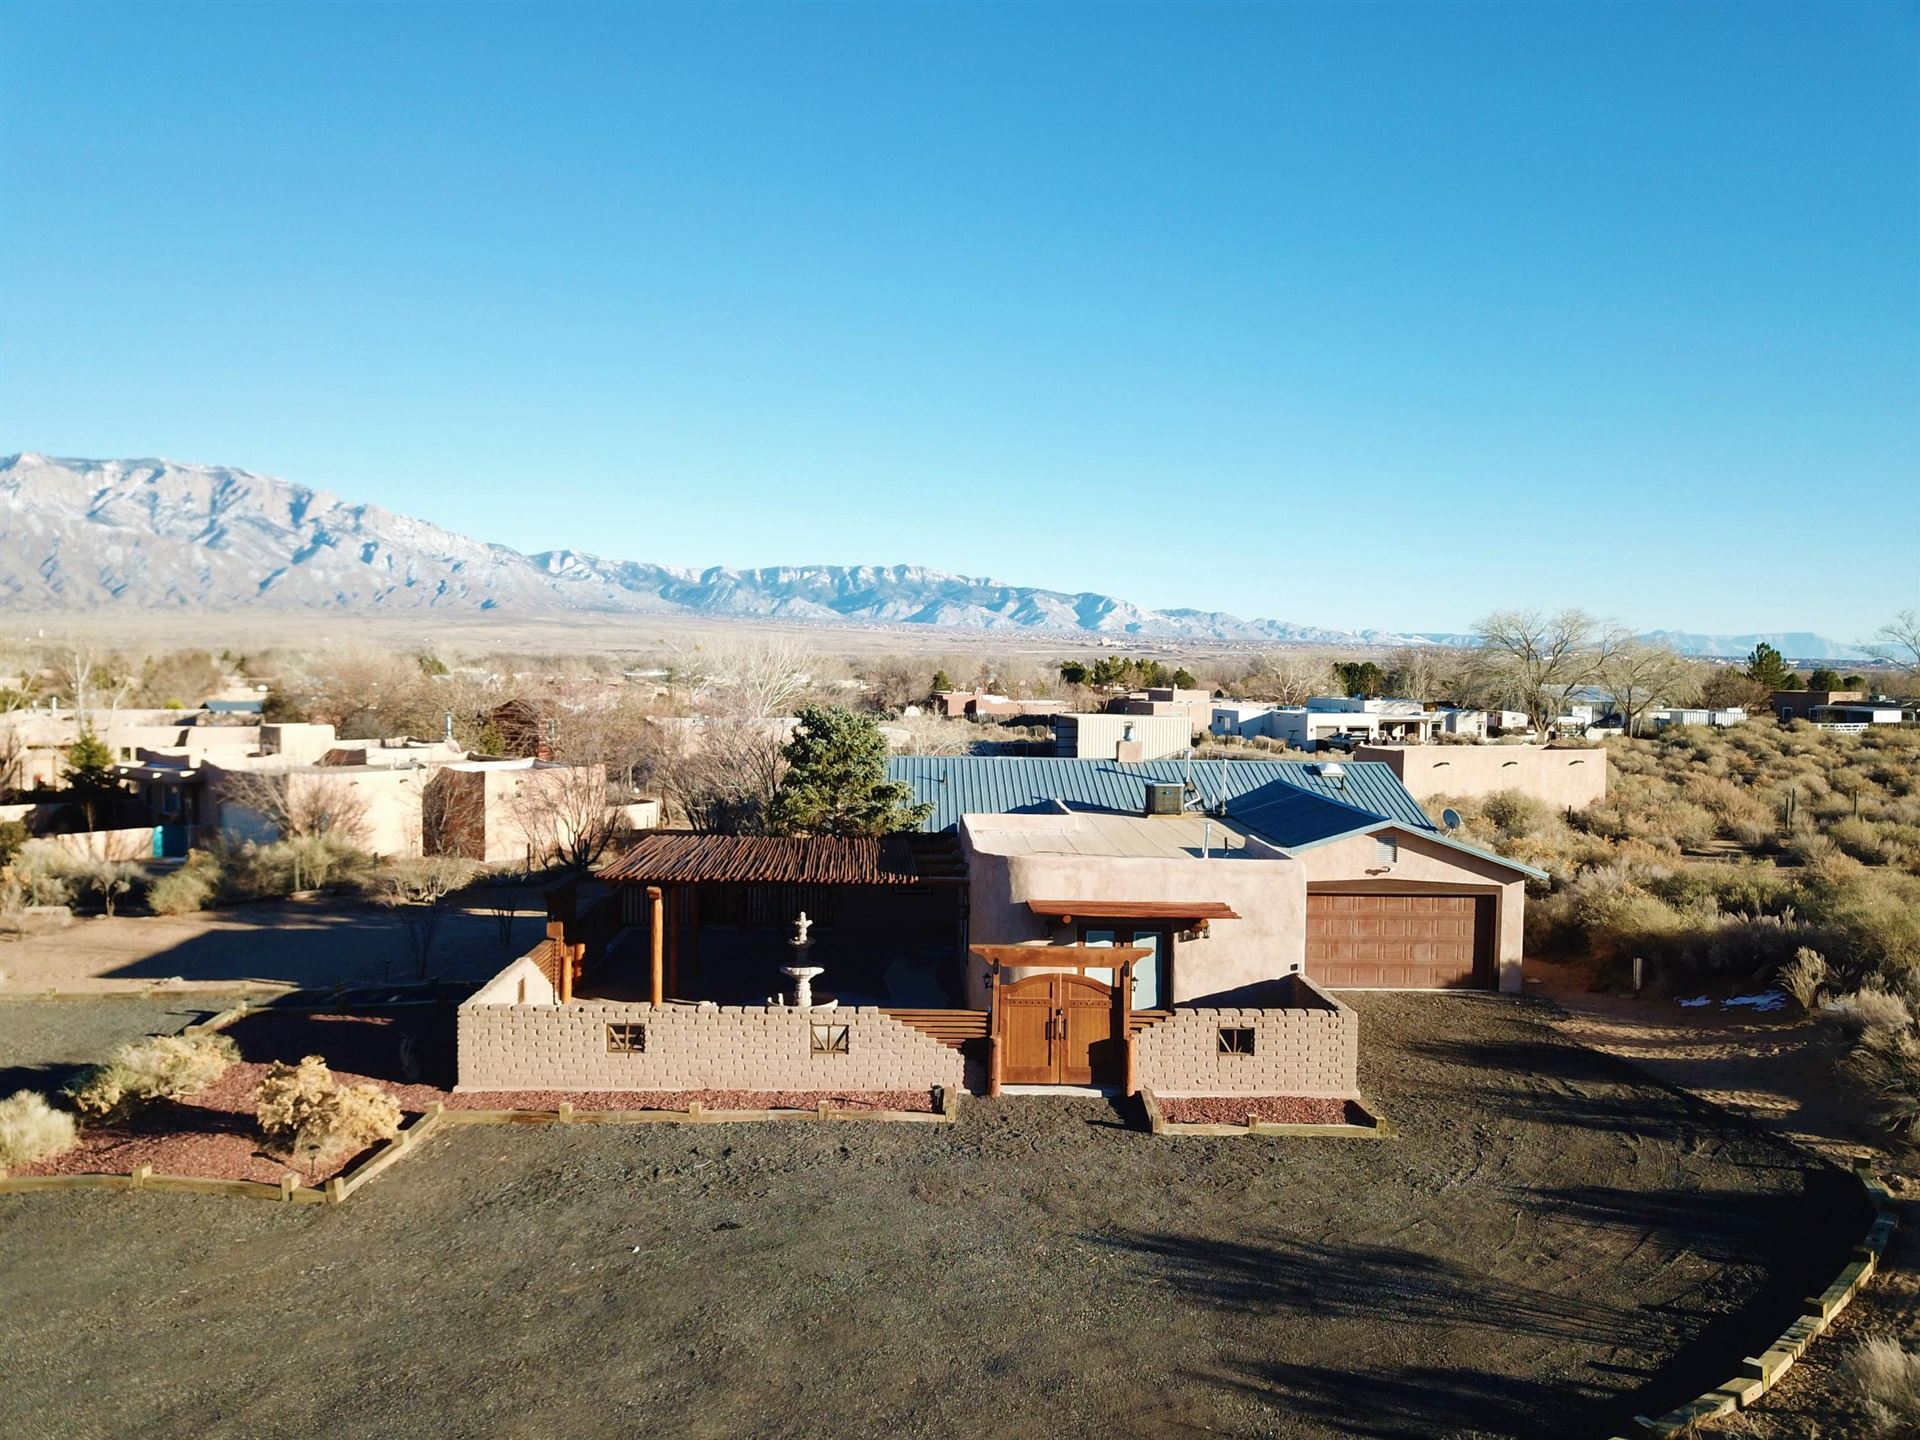 Photo of 143 MIKAELA Road, Corrales, NM 87048 (MLS # 986185)